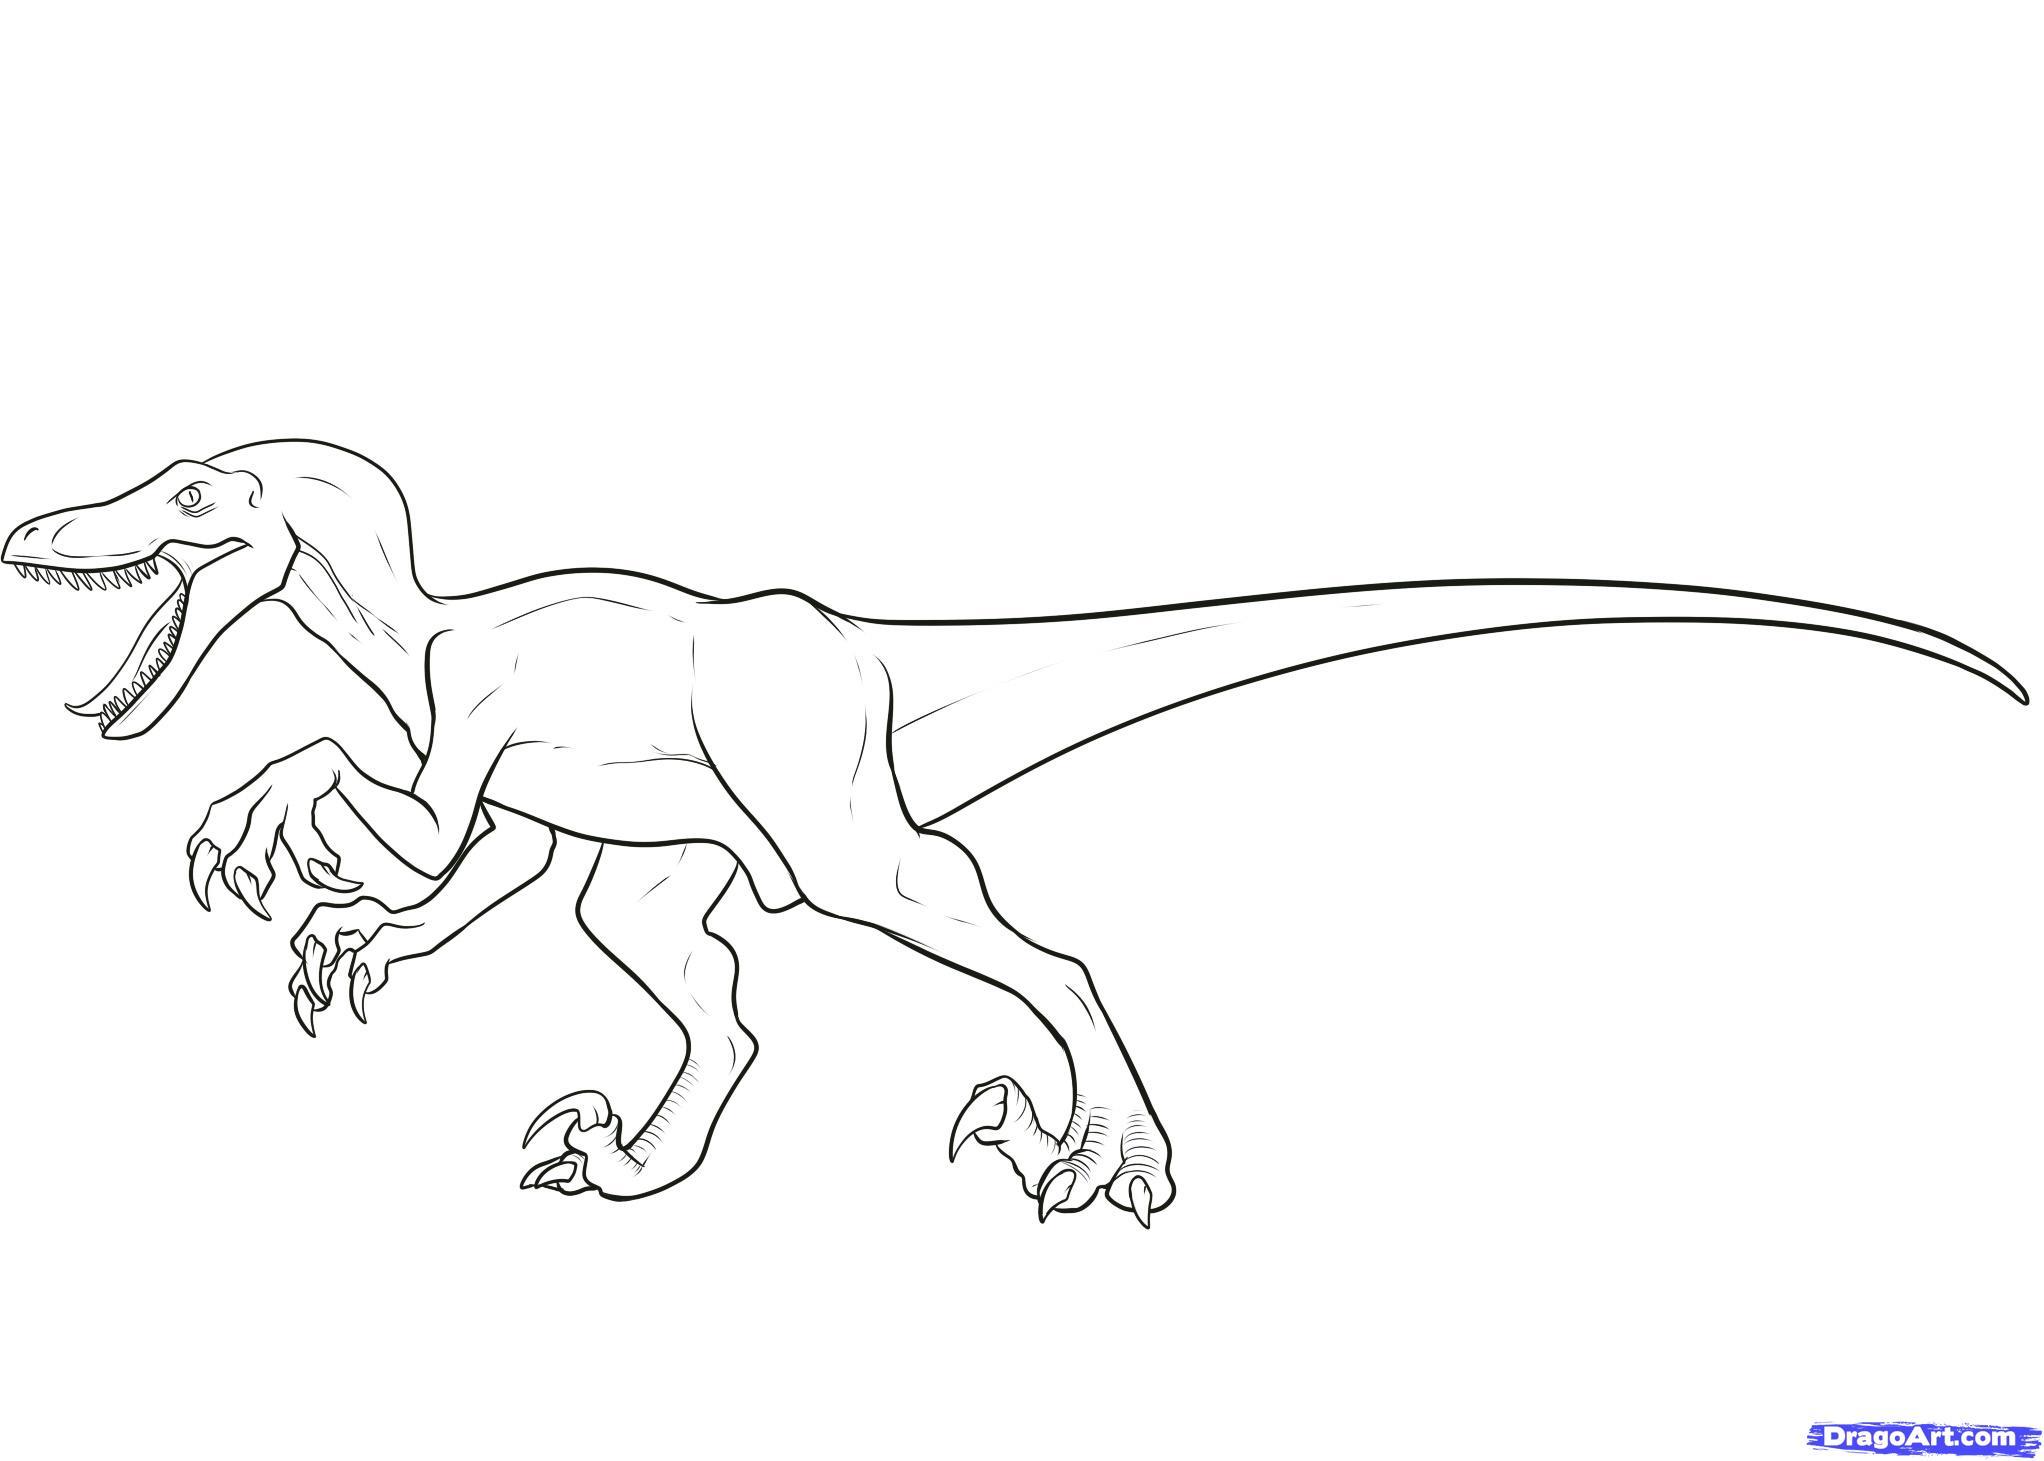 Drawn velociraptor 8 to velociraptor velociraptor a